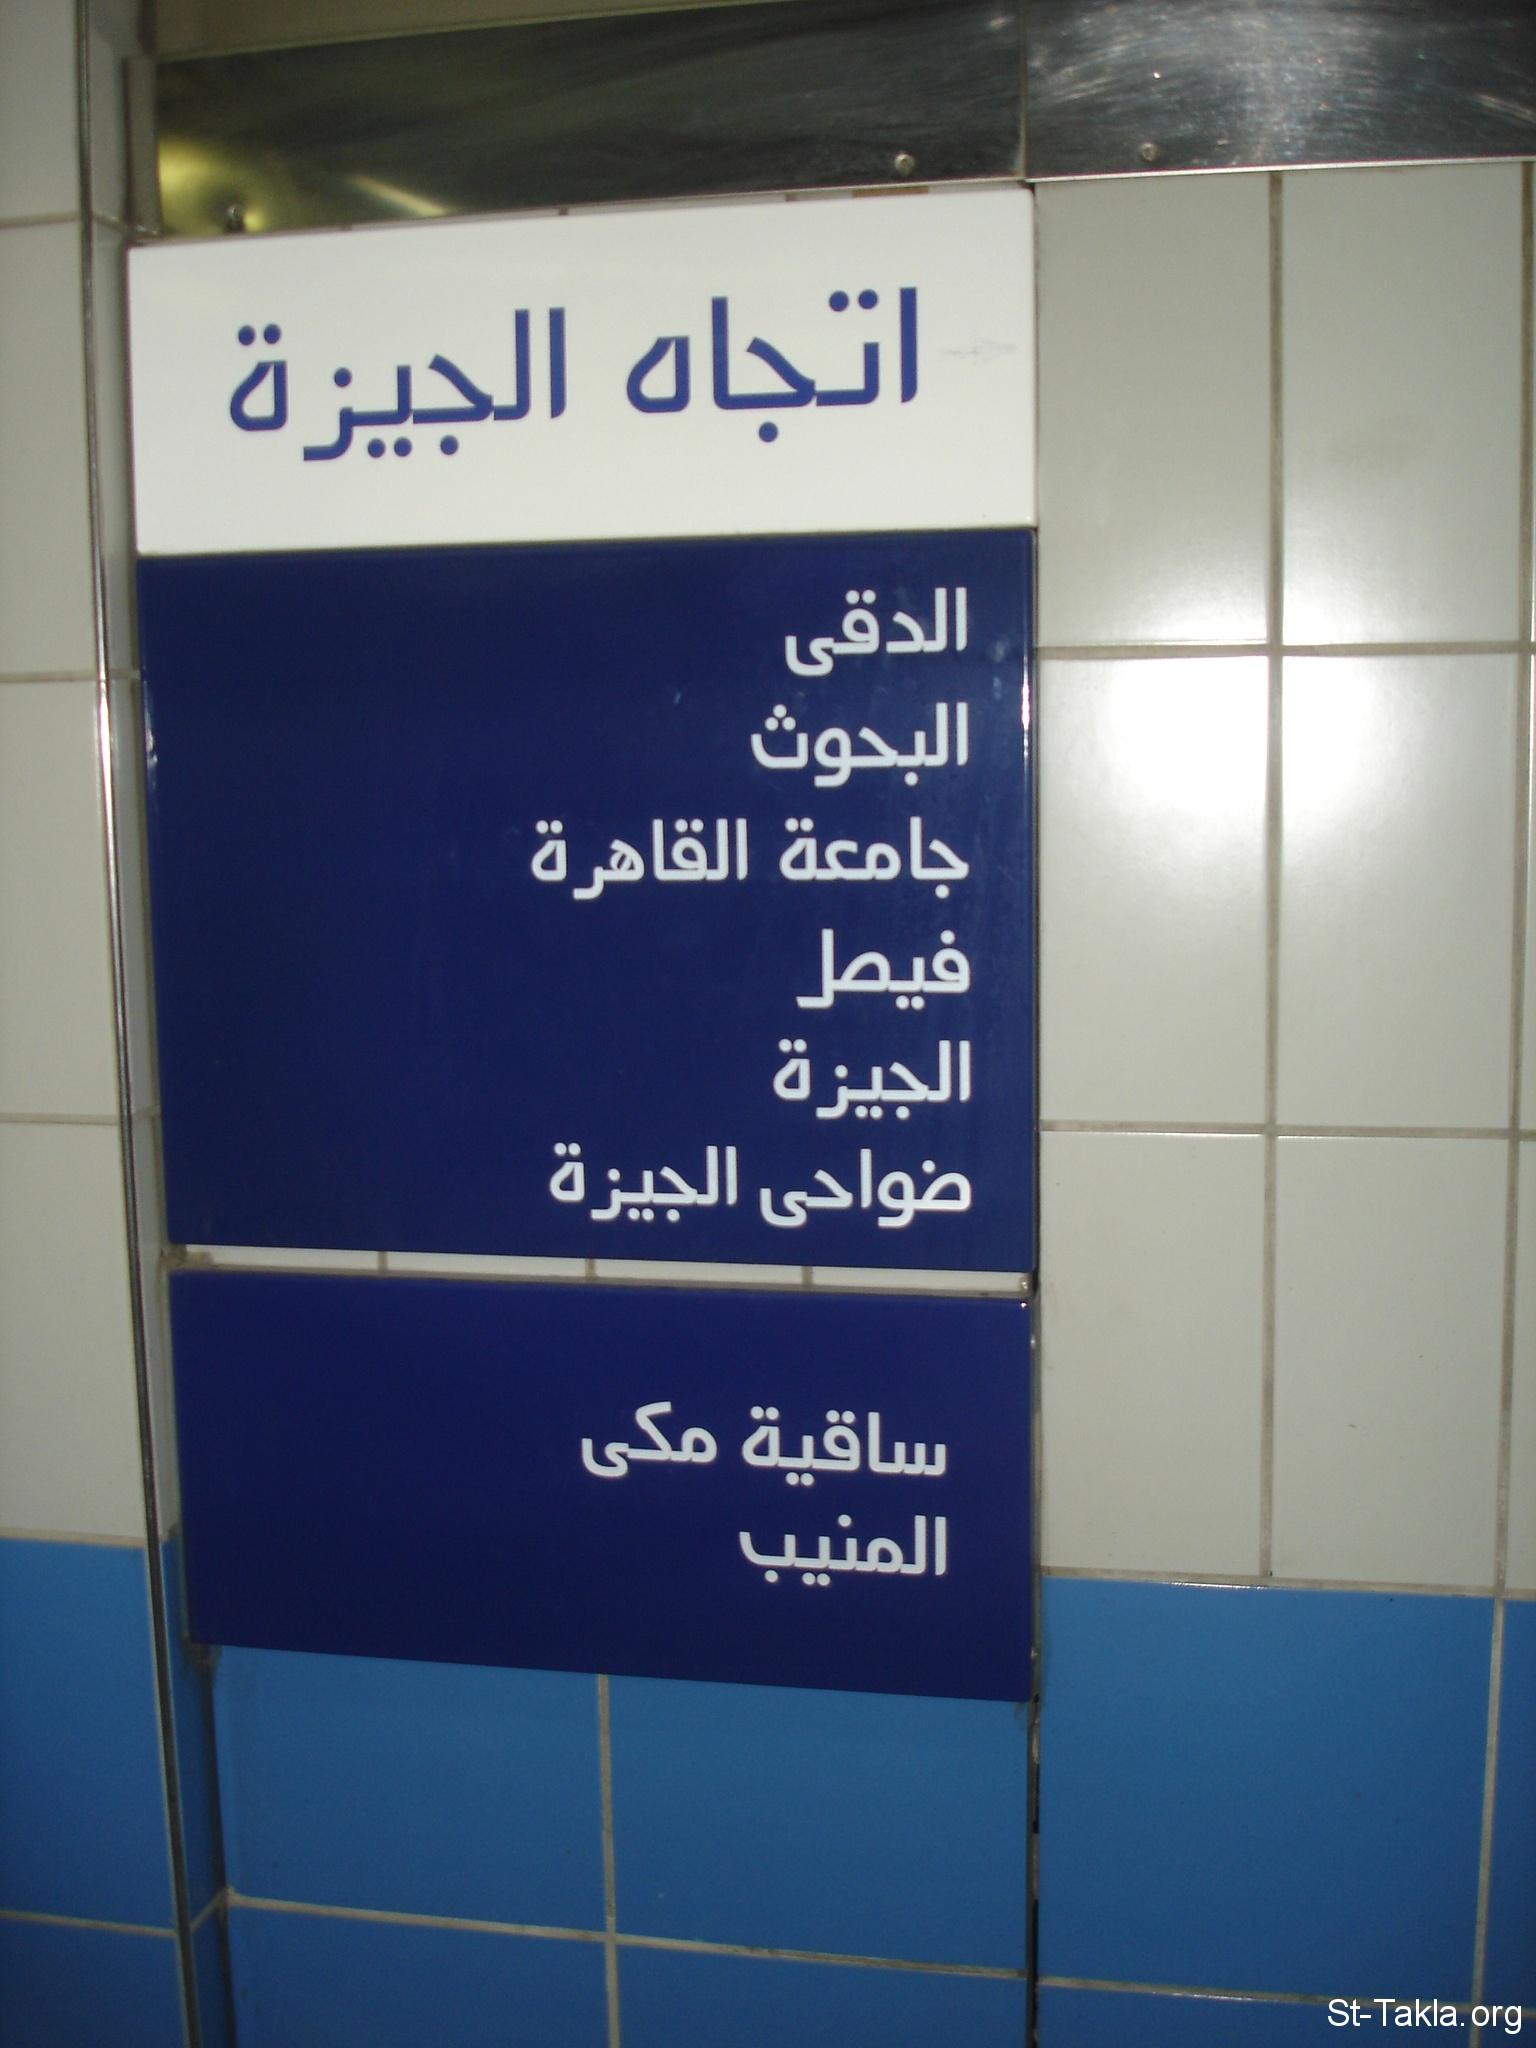 httpst-taklaorgGalleryvaralbumsEgyptgovernorates01-cairometrowww-St-Takla-org--cairo-metro-12jpgm1419425469